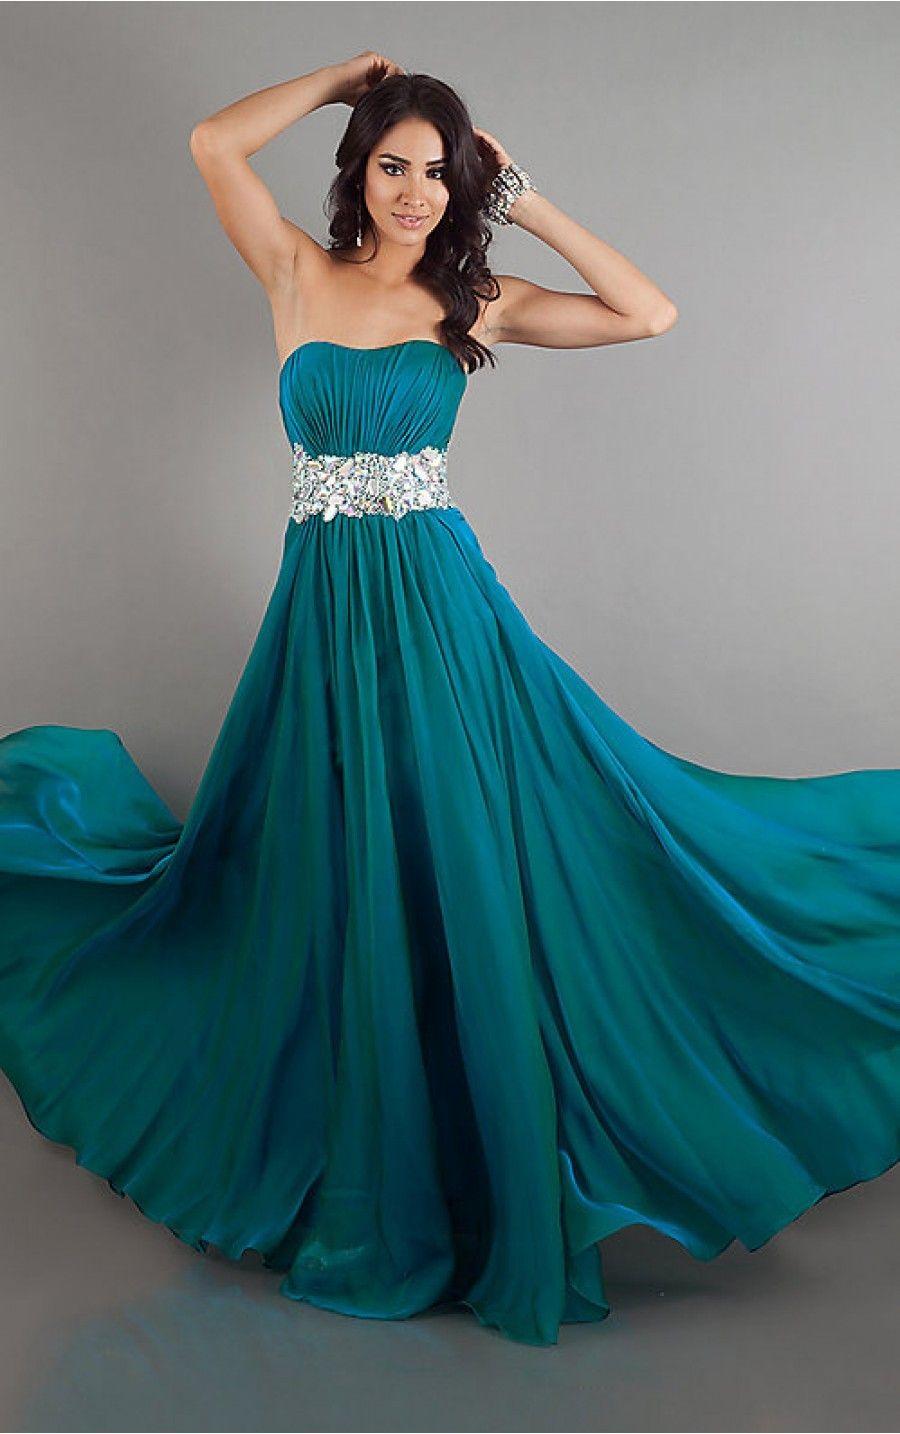 Wow!! I want this dress!! <3 Found online at: http://www.formaldressalenz.com/a-line-floor-length-blue-chiffon-dress.html